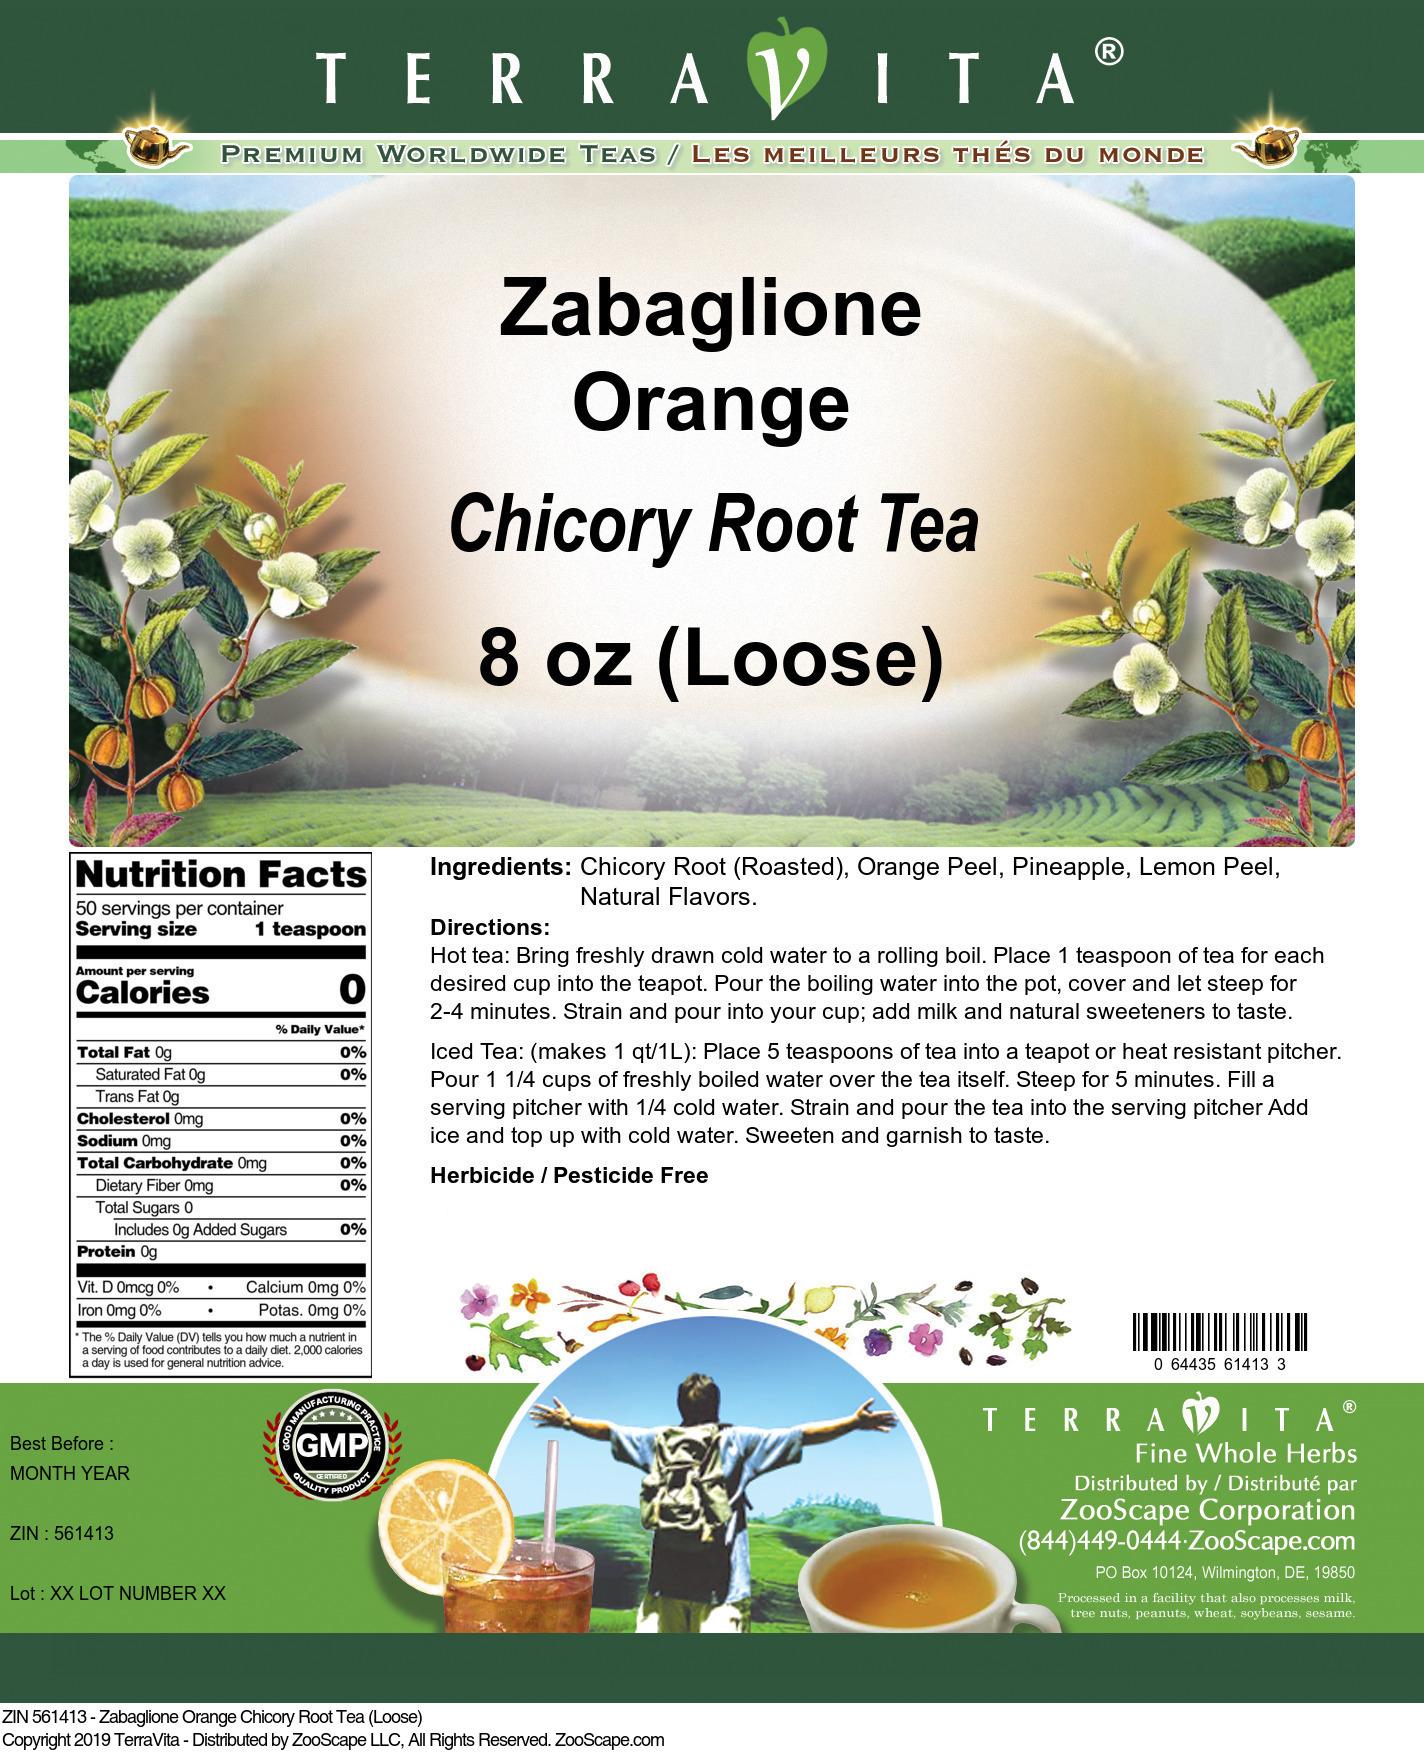 Zabaglione Orange Chicory Root